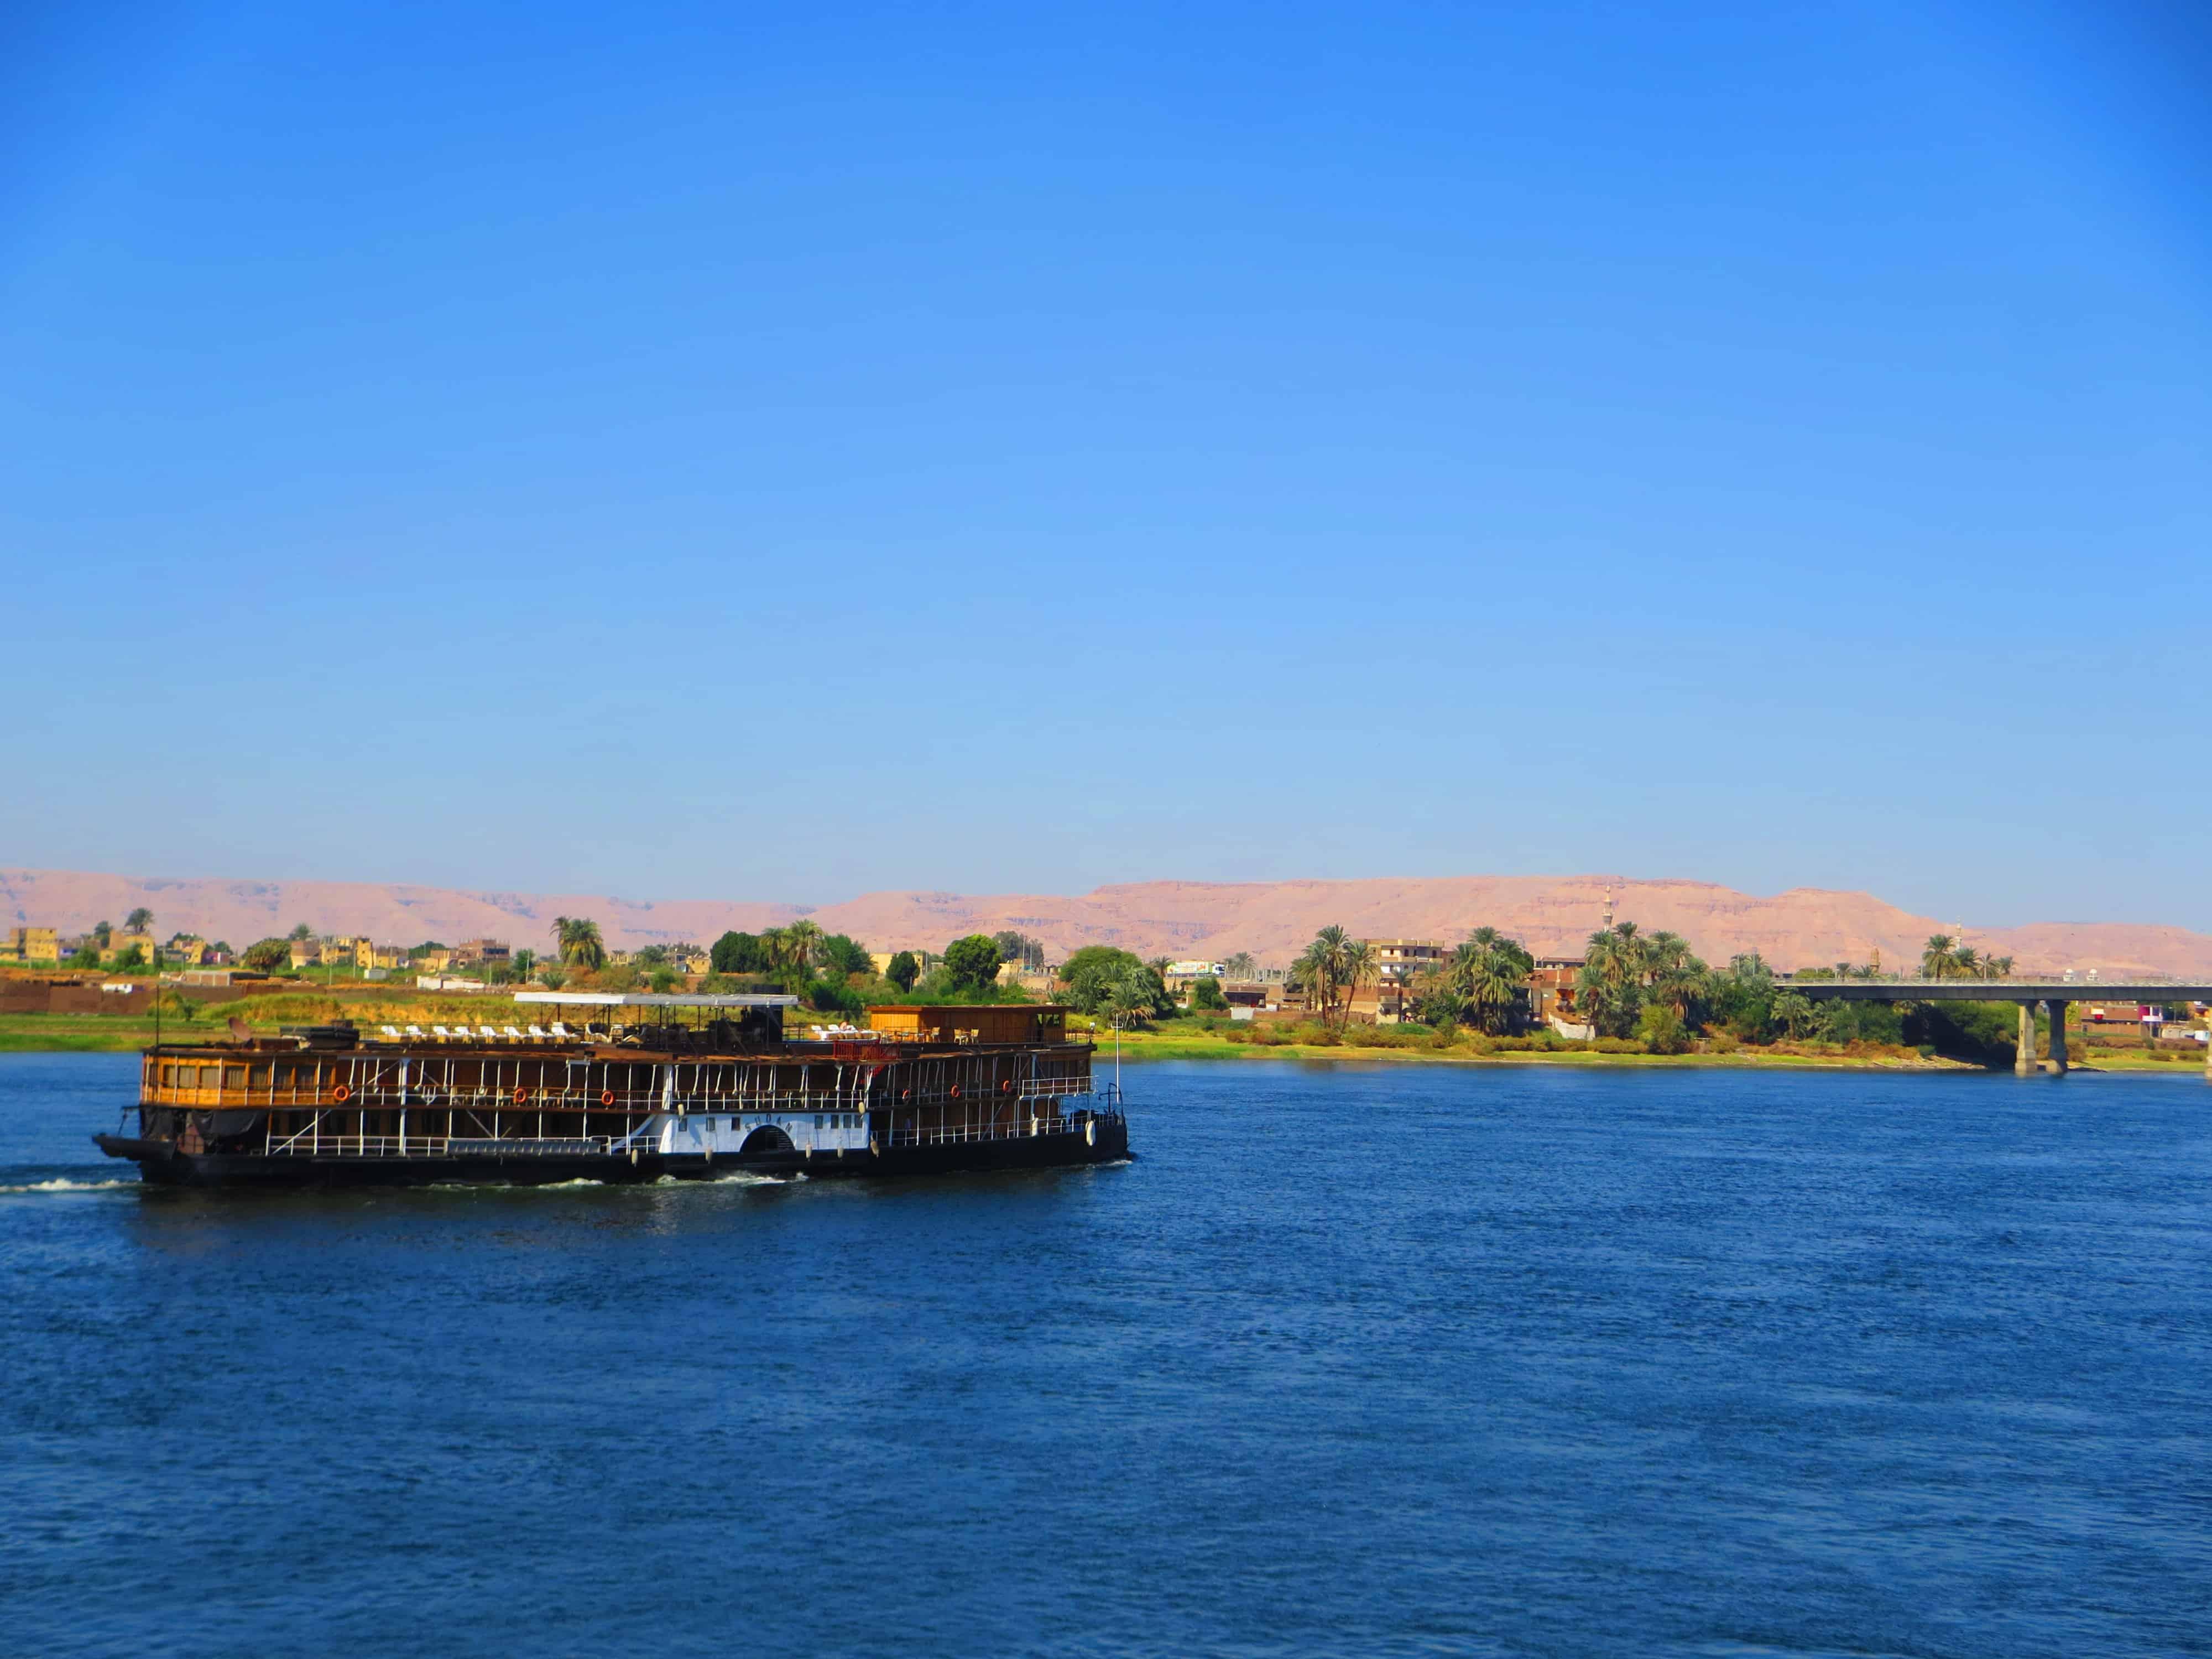 00 Nilkreuzfahrtschiff SS Sudan Luxor Nilkreuzfahrt Aegypten